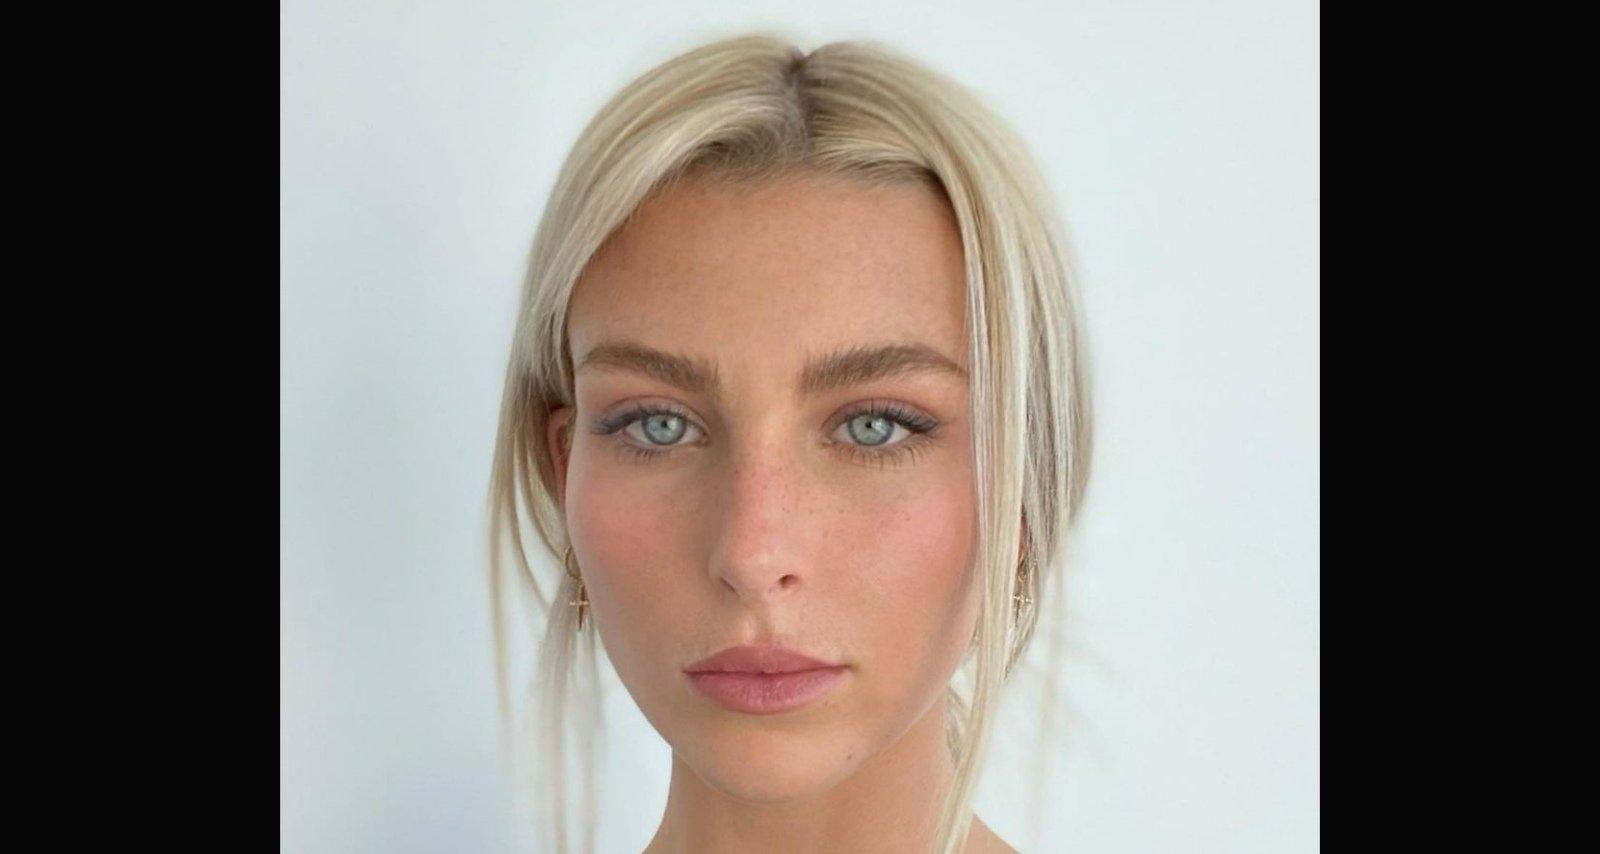 Paige Lorenze